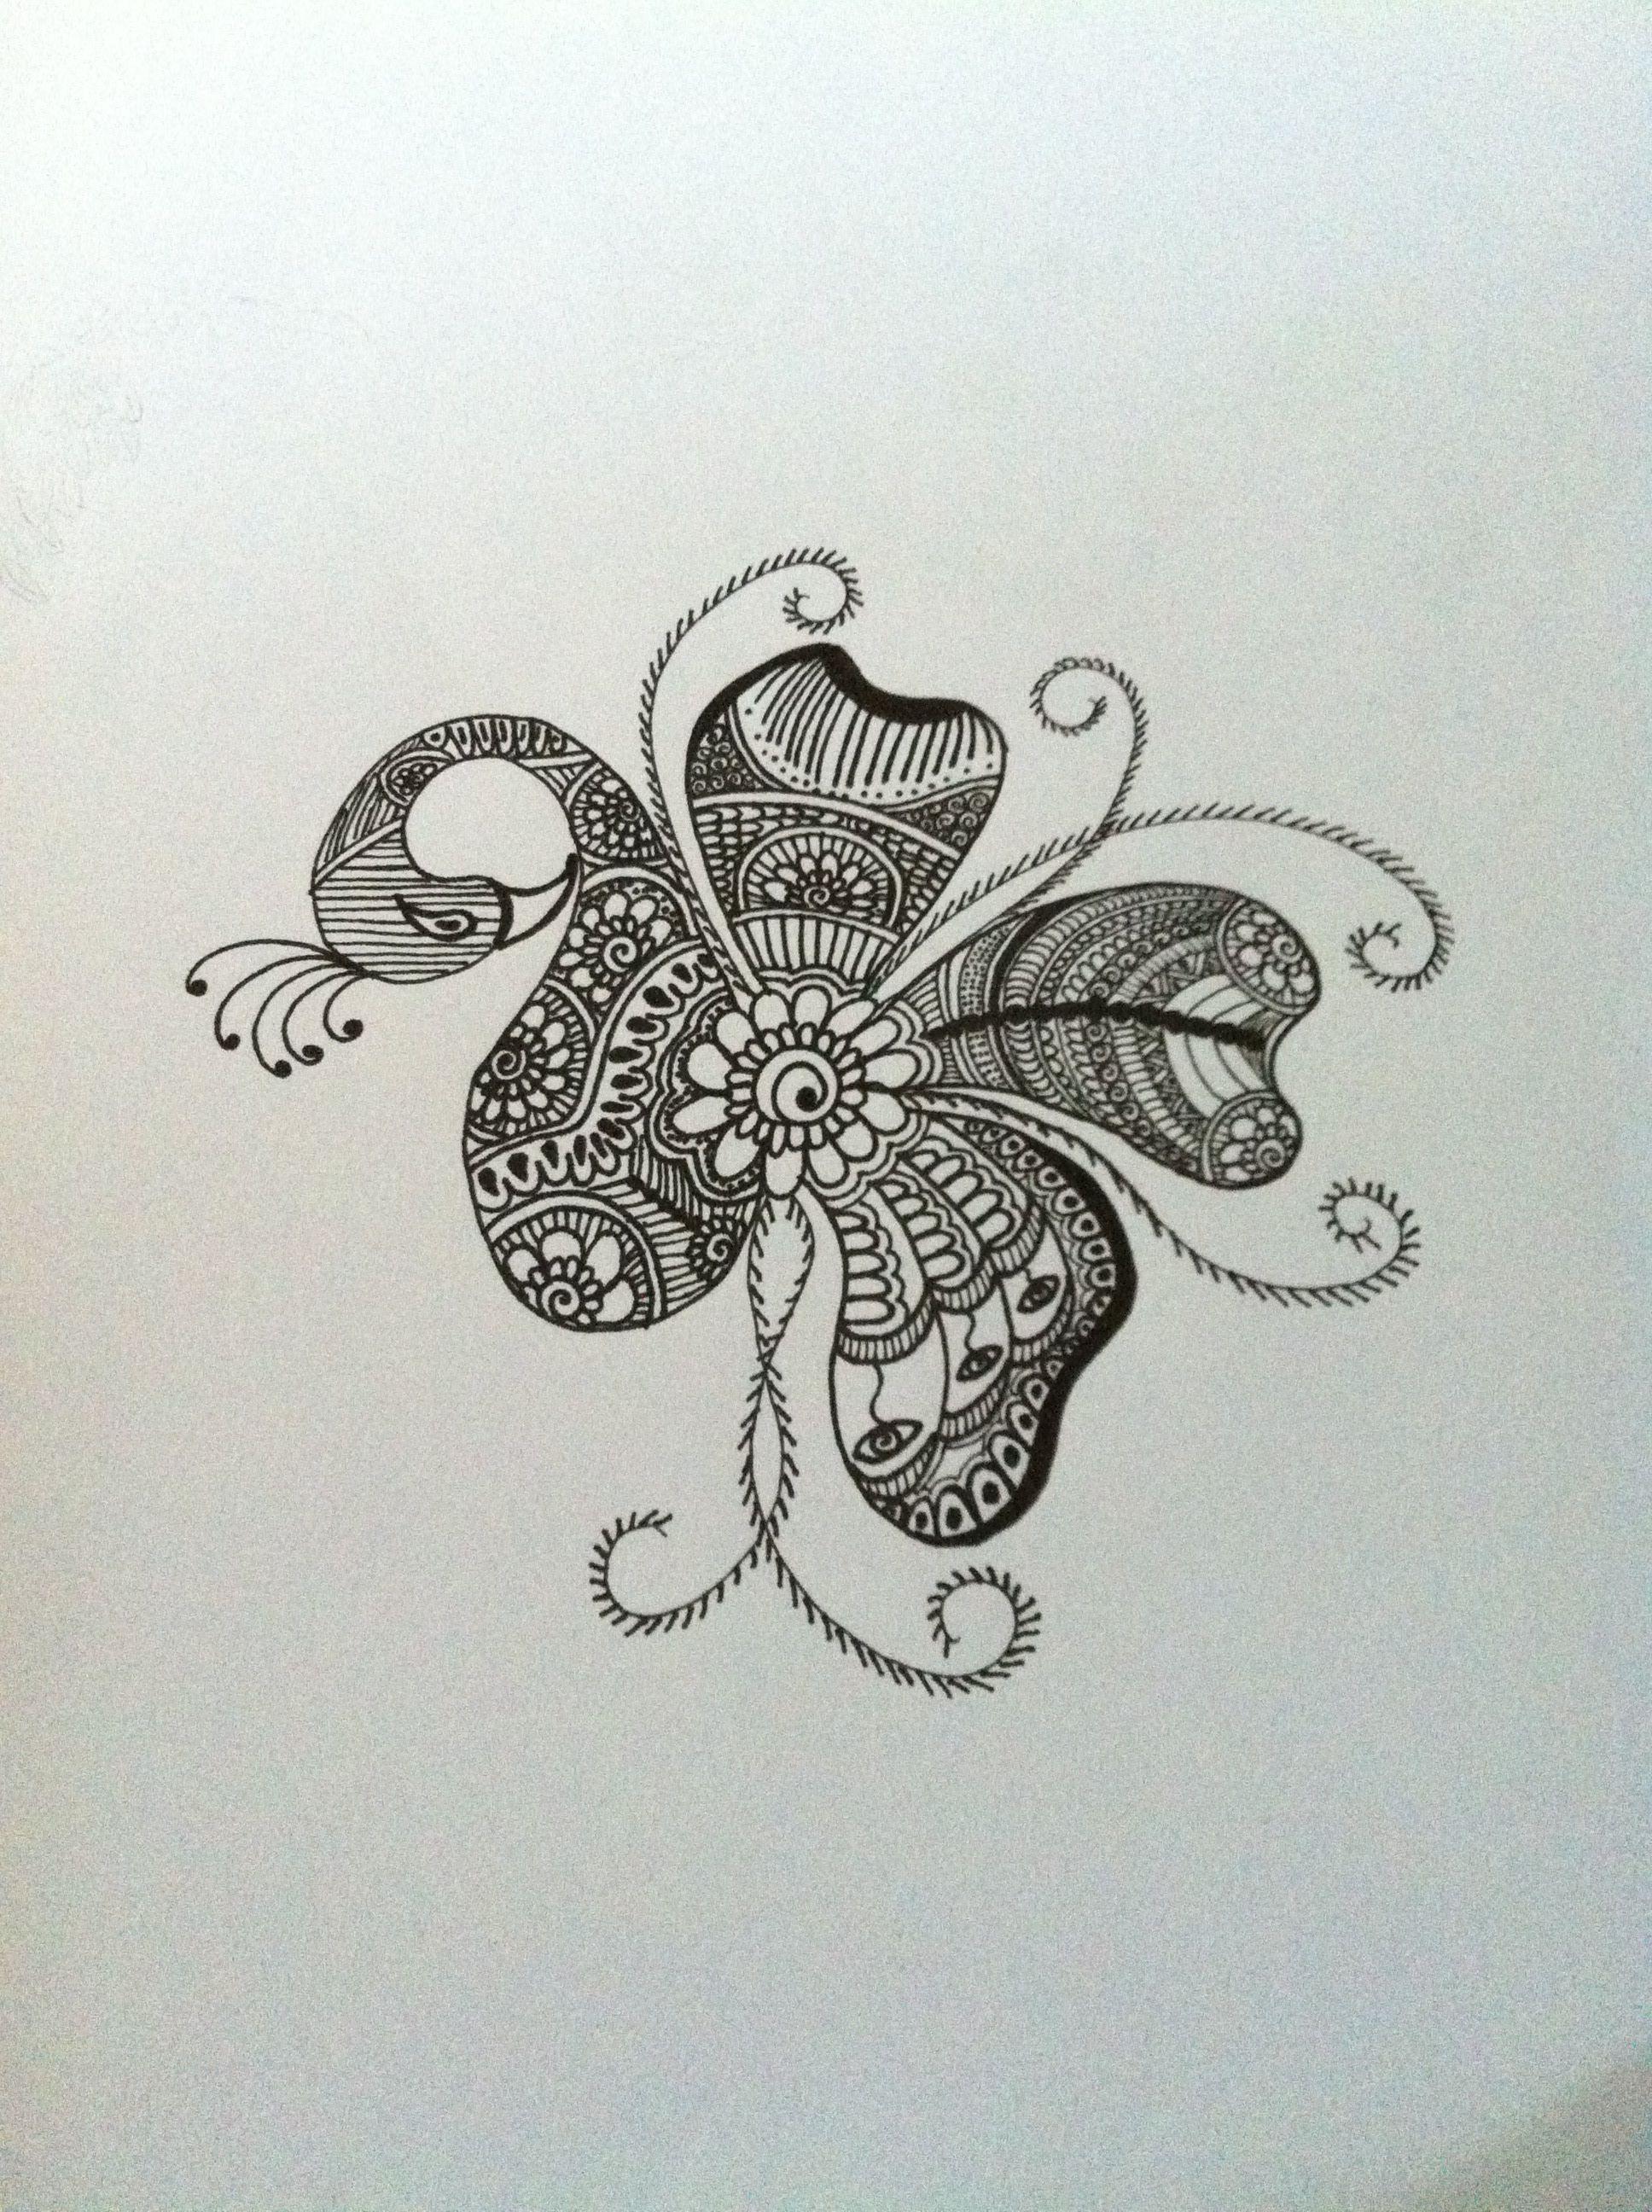 Mehndi Henna Pen : Finished mehndi indian henna peacock pen drawing art